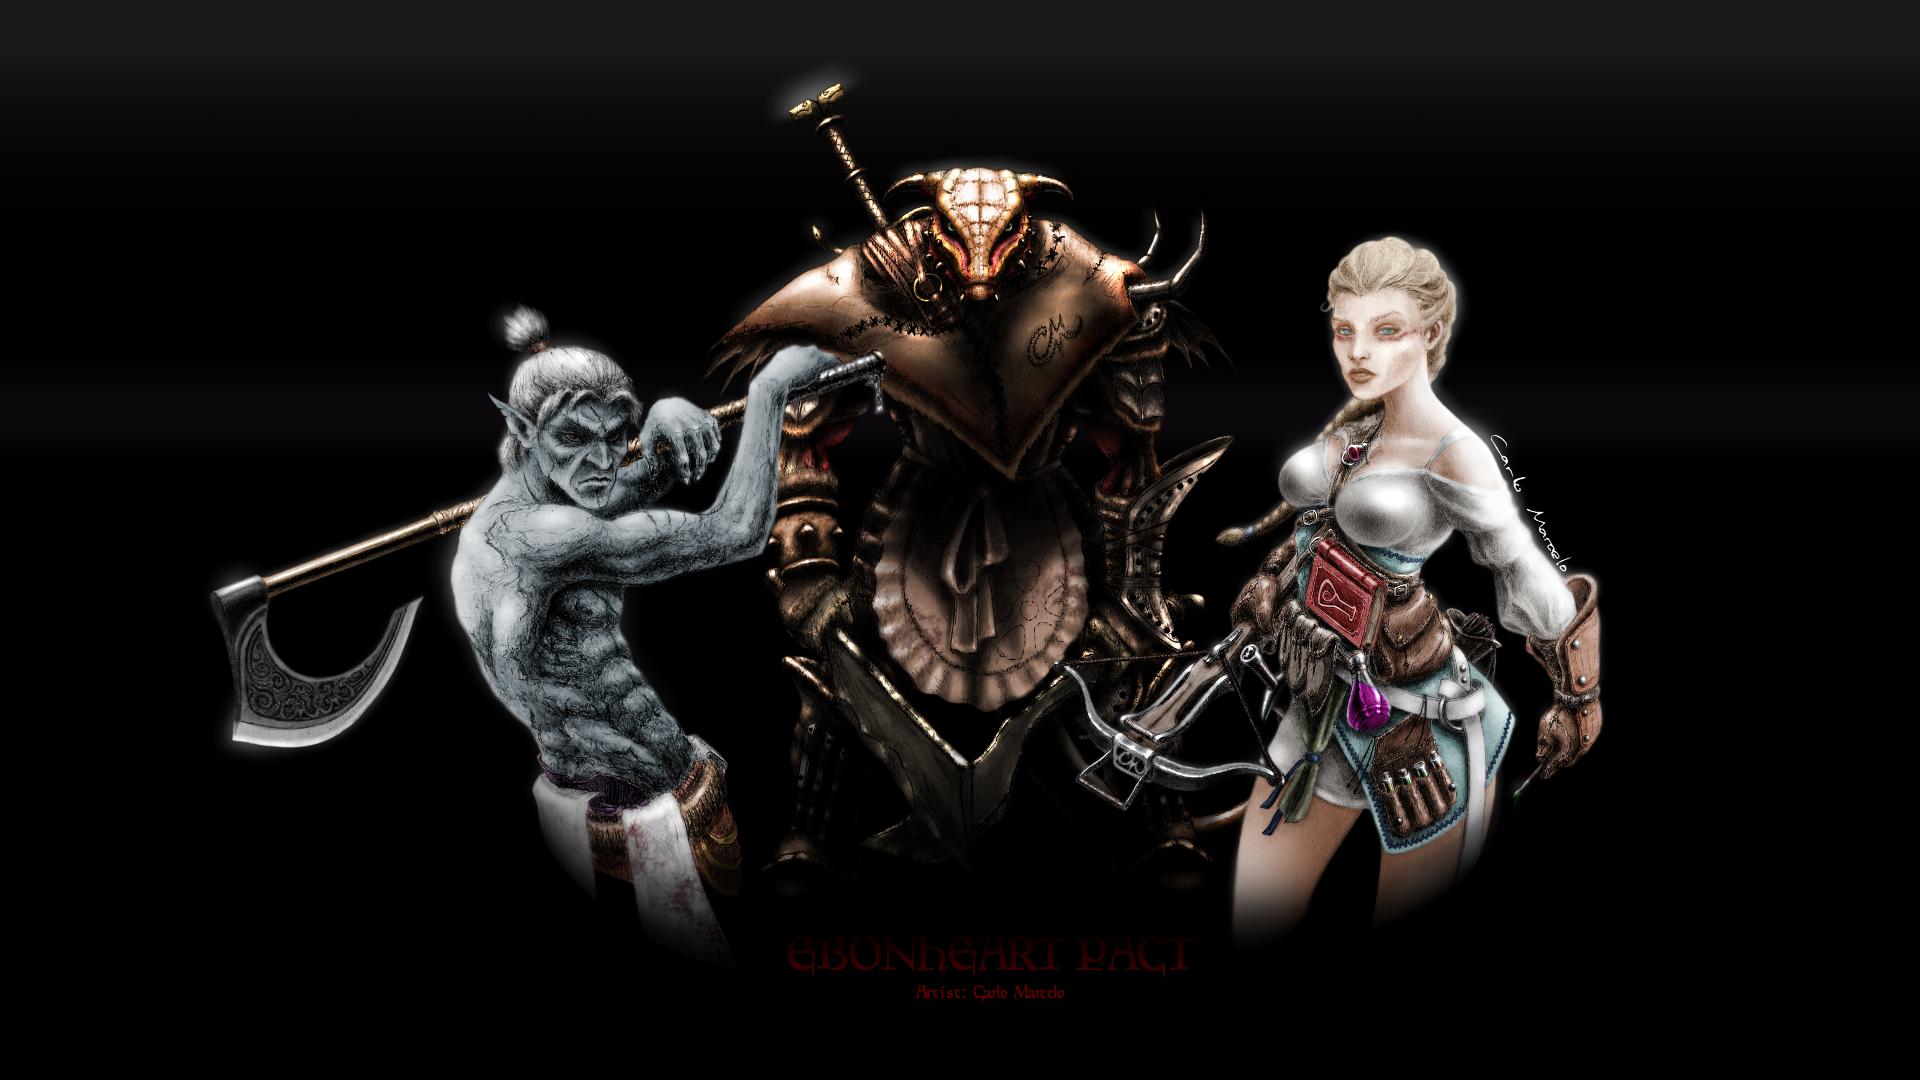 Elder Scrolls Online Ebonheart Pact Armor Ebonheart pact  you came toElder Scrolls Online Ebonheart Pact